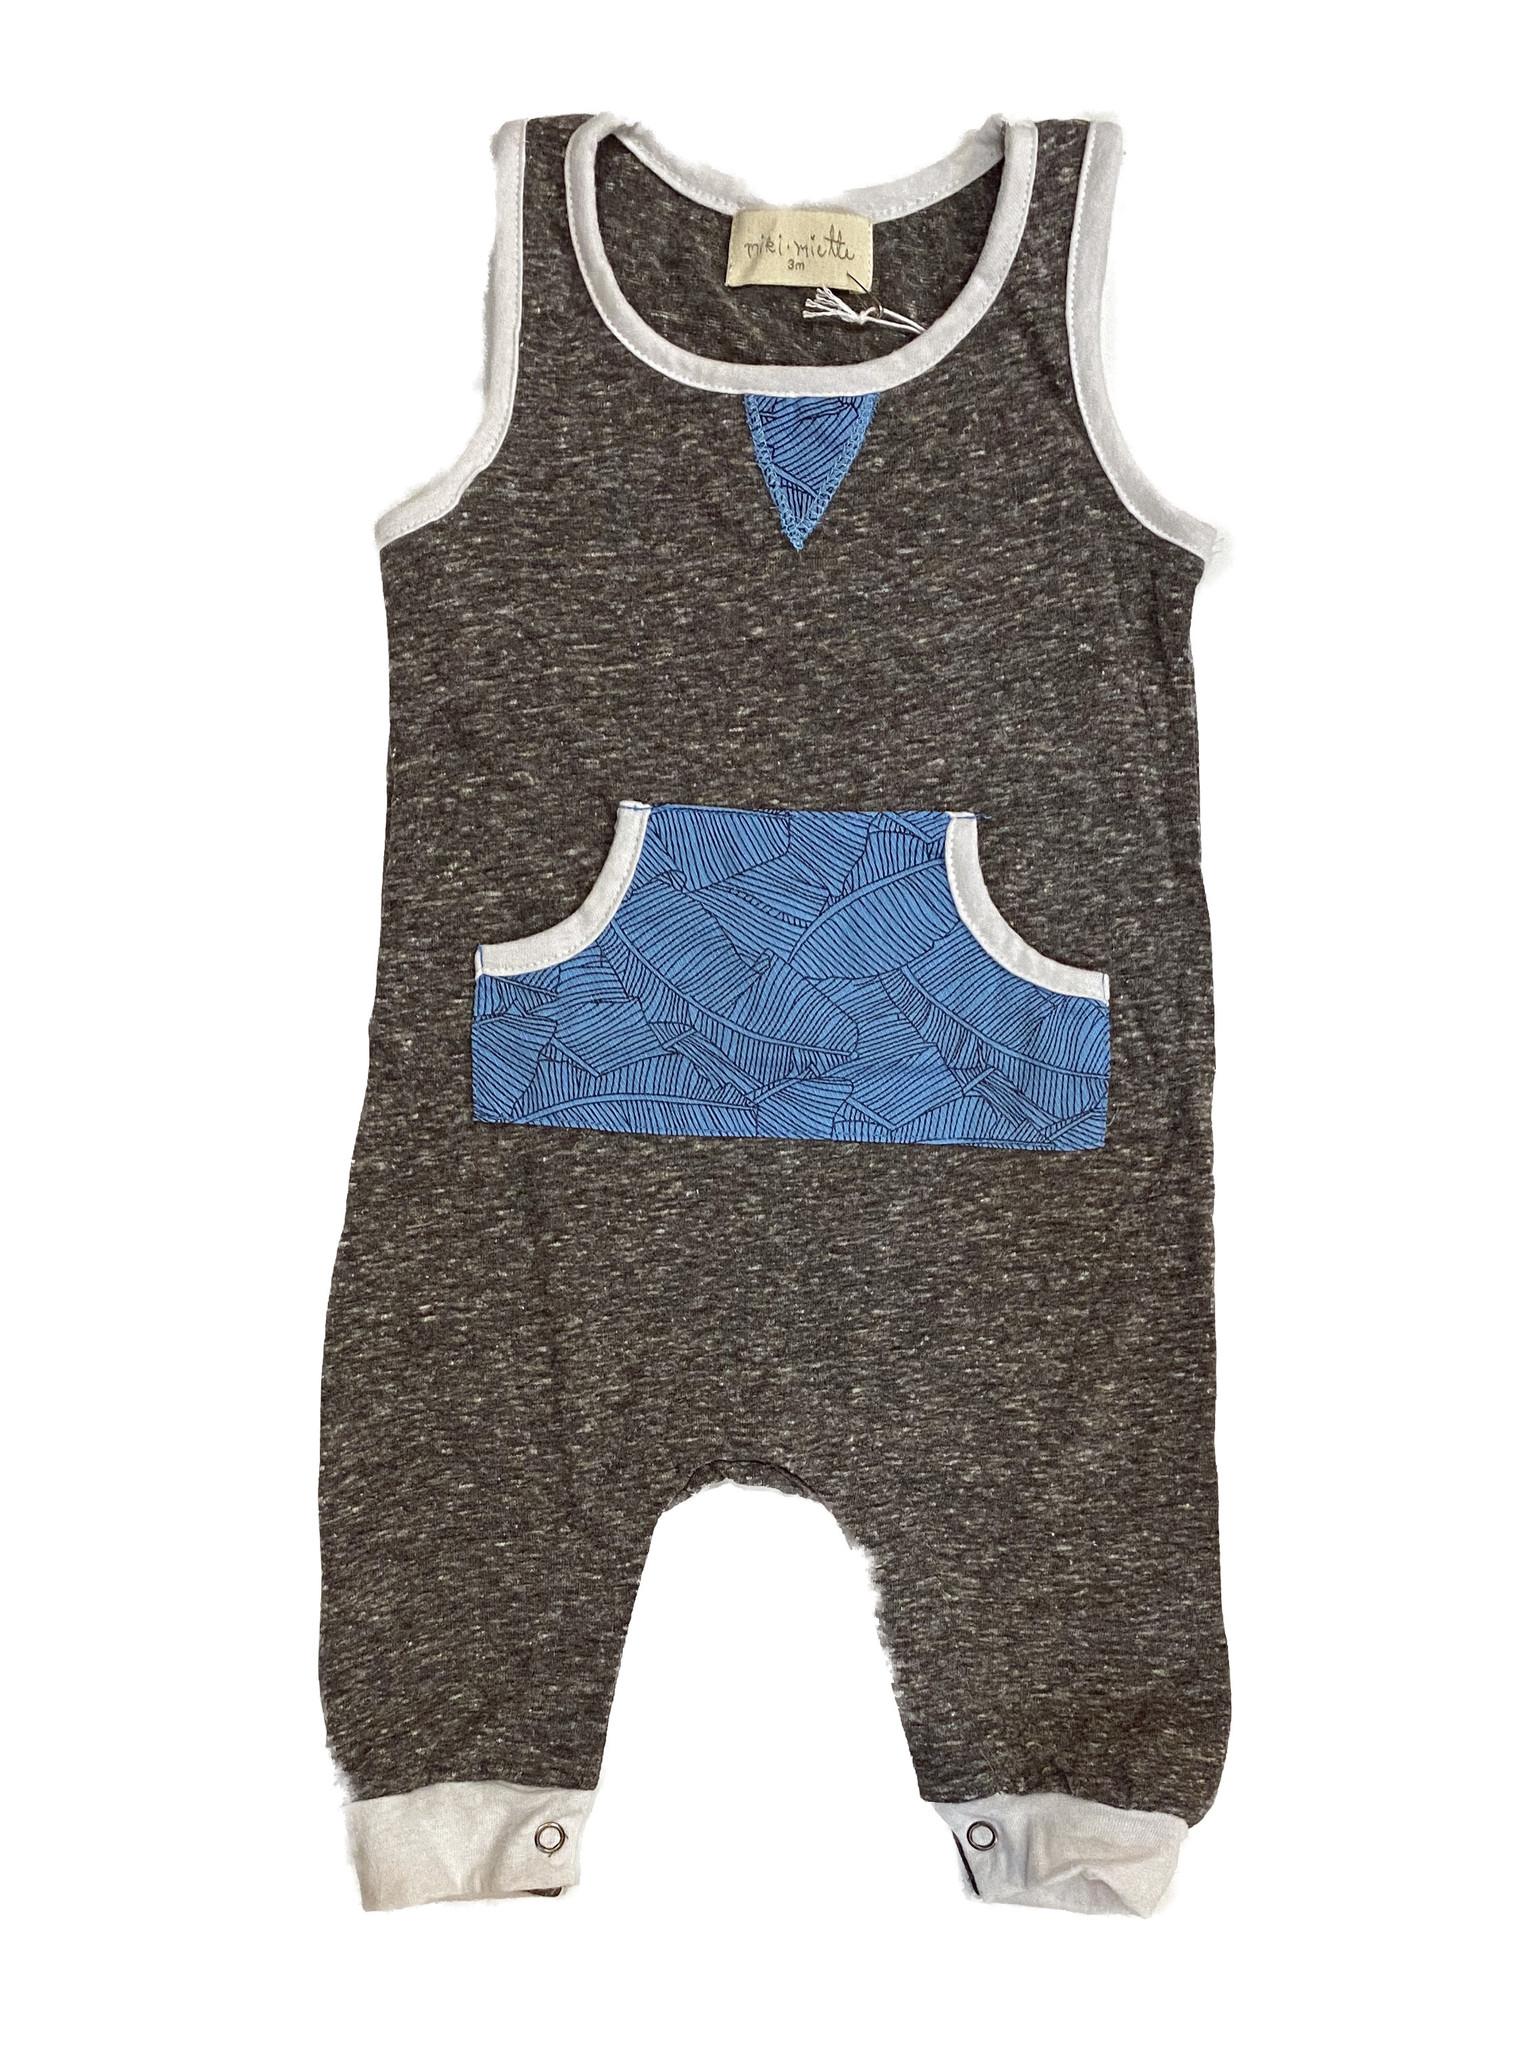 Miki Miette gray/blue pocket romper